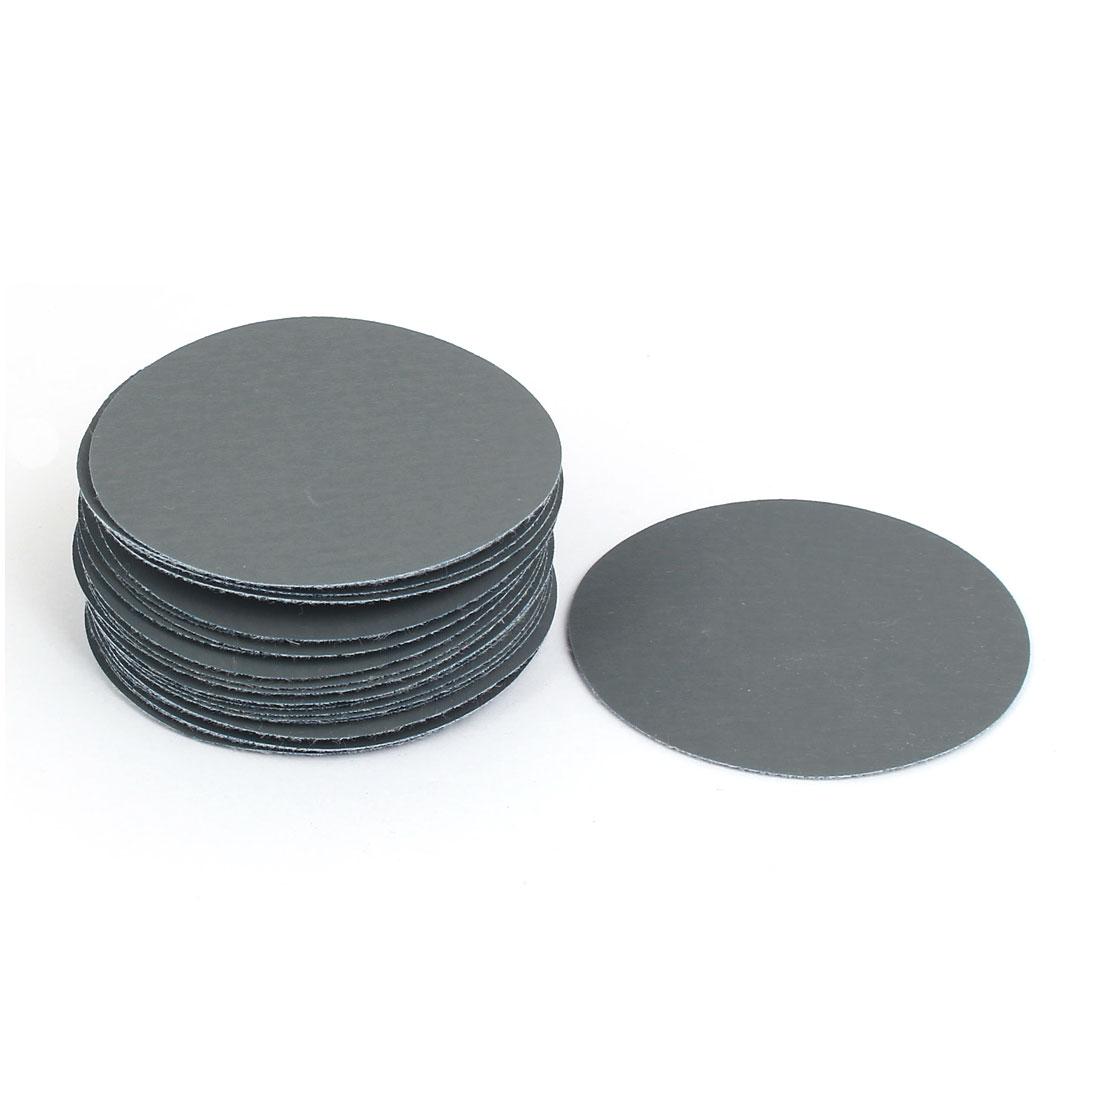 "3000 Grit 3"" Diameter Sandpaper Hook Loop Sanding Disc 30 Pcs"